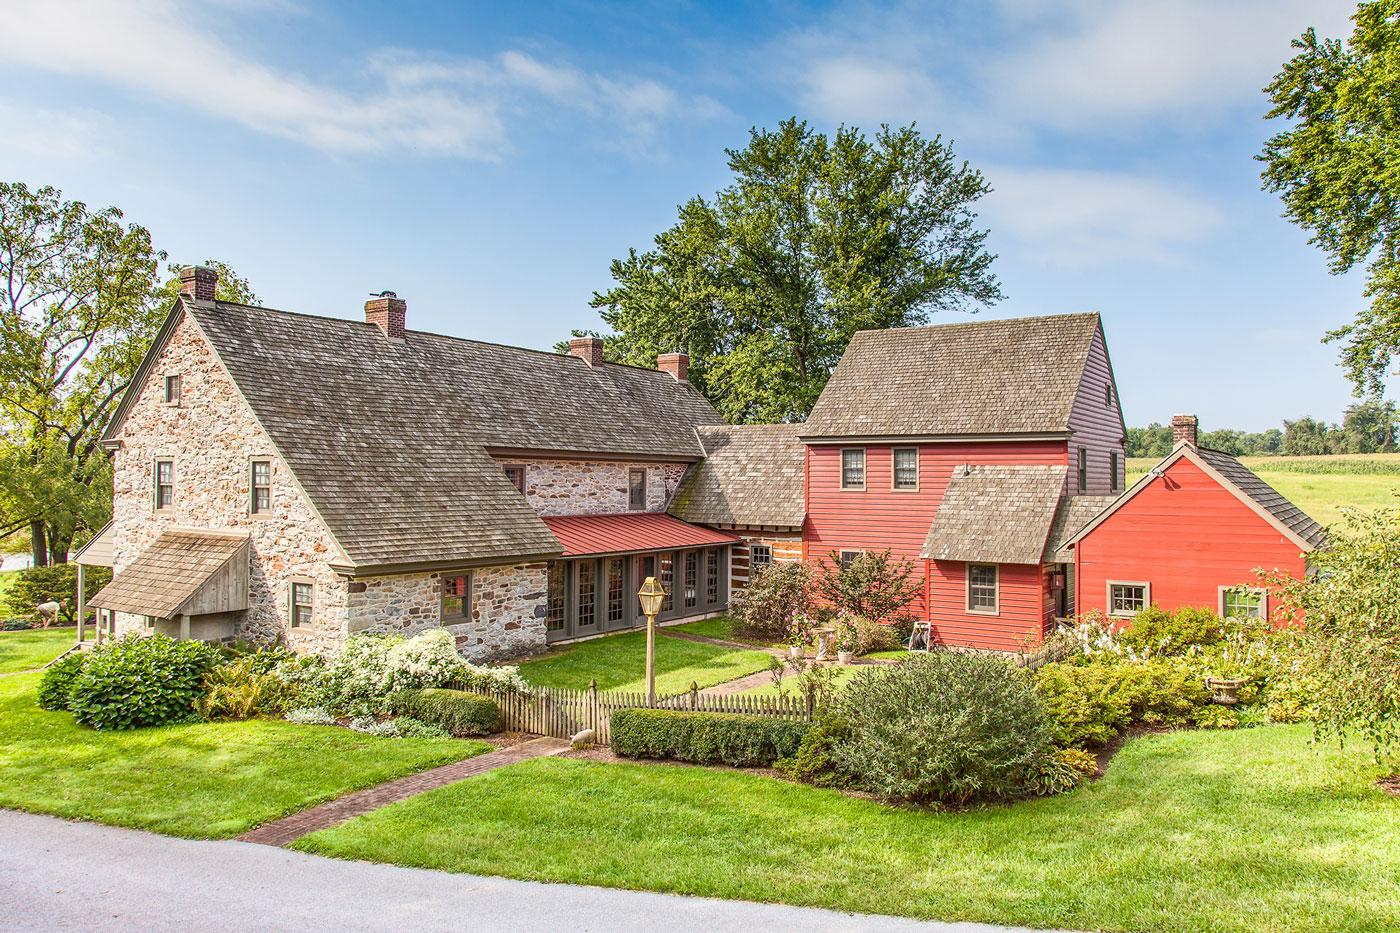 berks county farm houses for sale jeffreyhoguerealtor com rh jeffreyhoguerealtor com